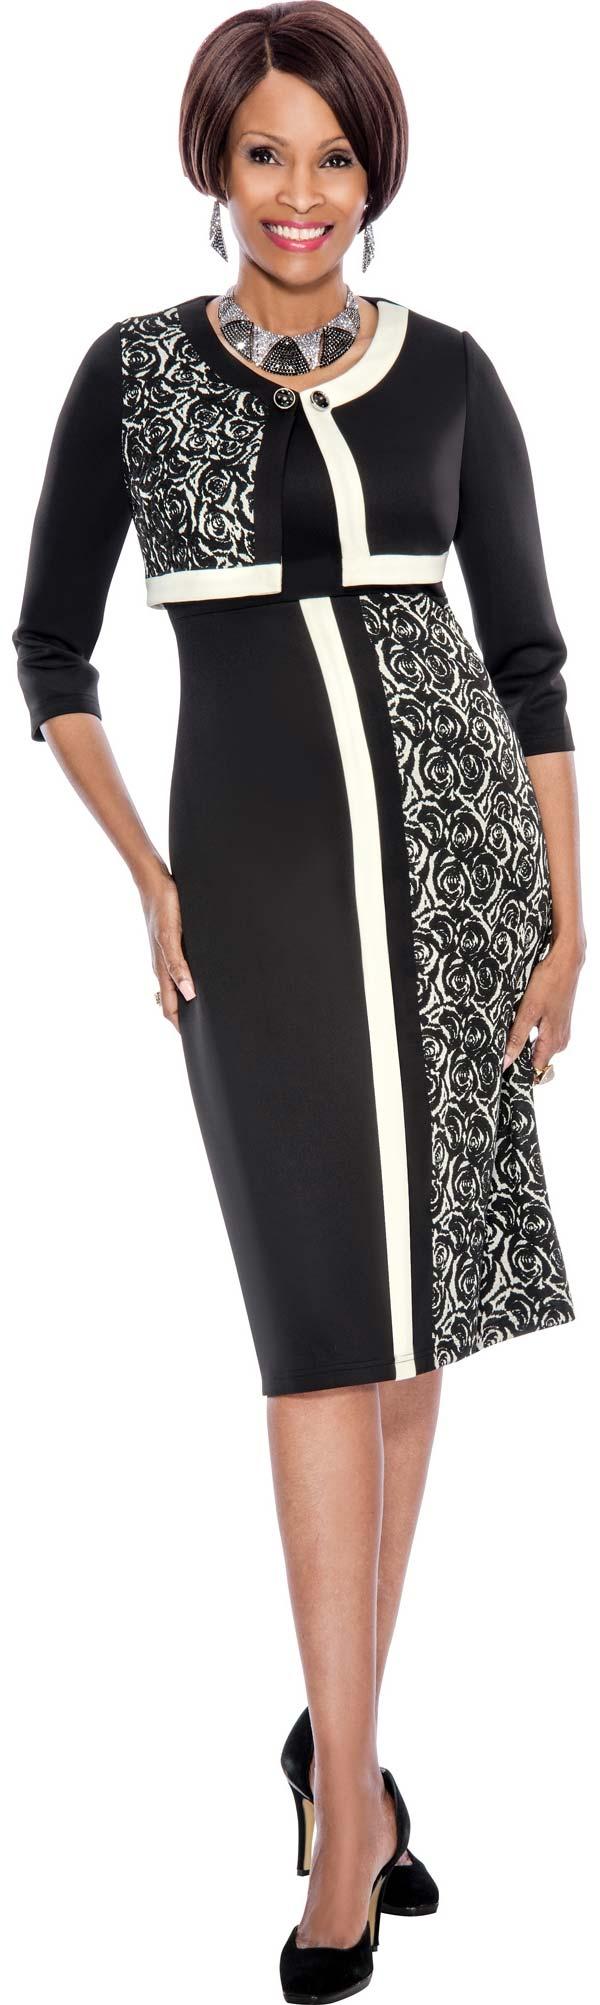 Terramina 7502 - Church Dress With Floral Print Pattern Block Design